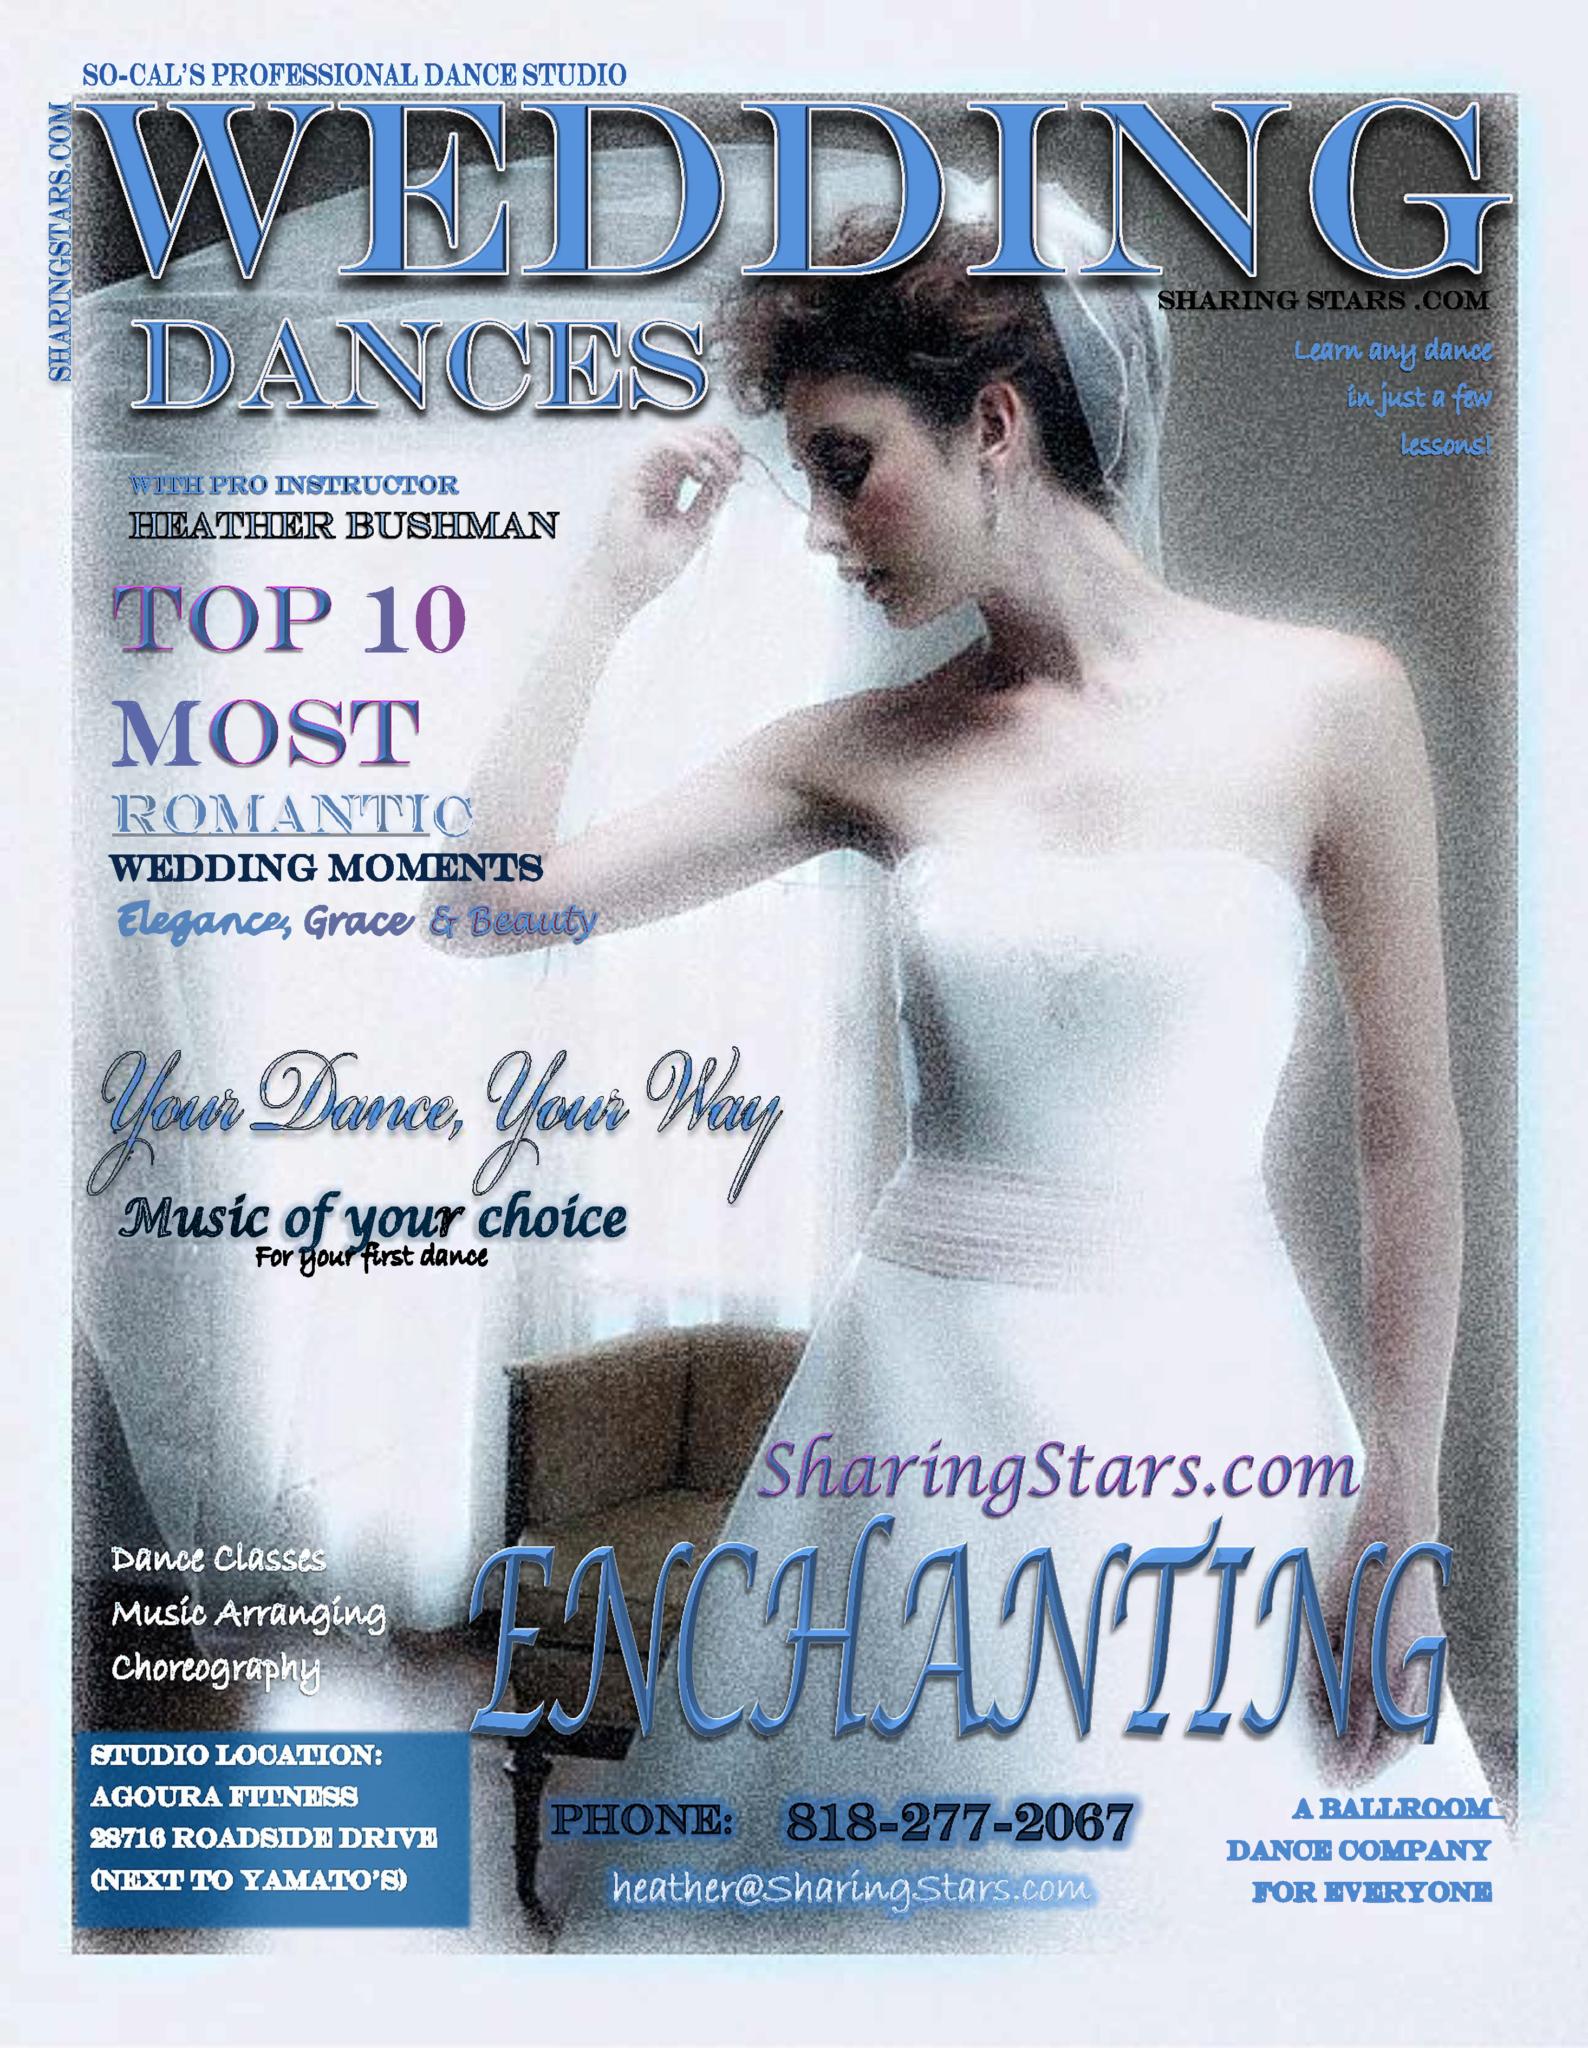 Wedding, Ballroom Dance Lessons, Agoura Hills, Oak Park, Thousand Oaks, Westlake Village, Sherman Oaks, Dance Lessons